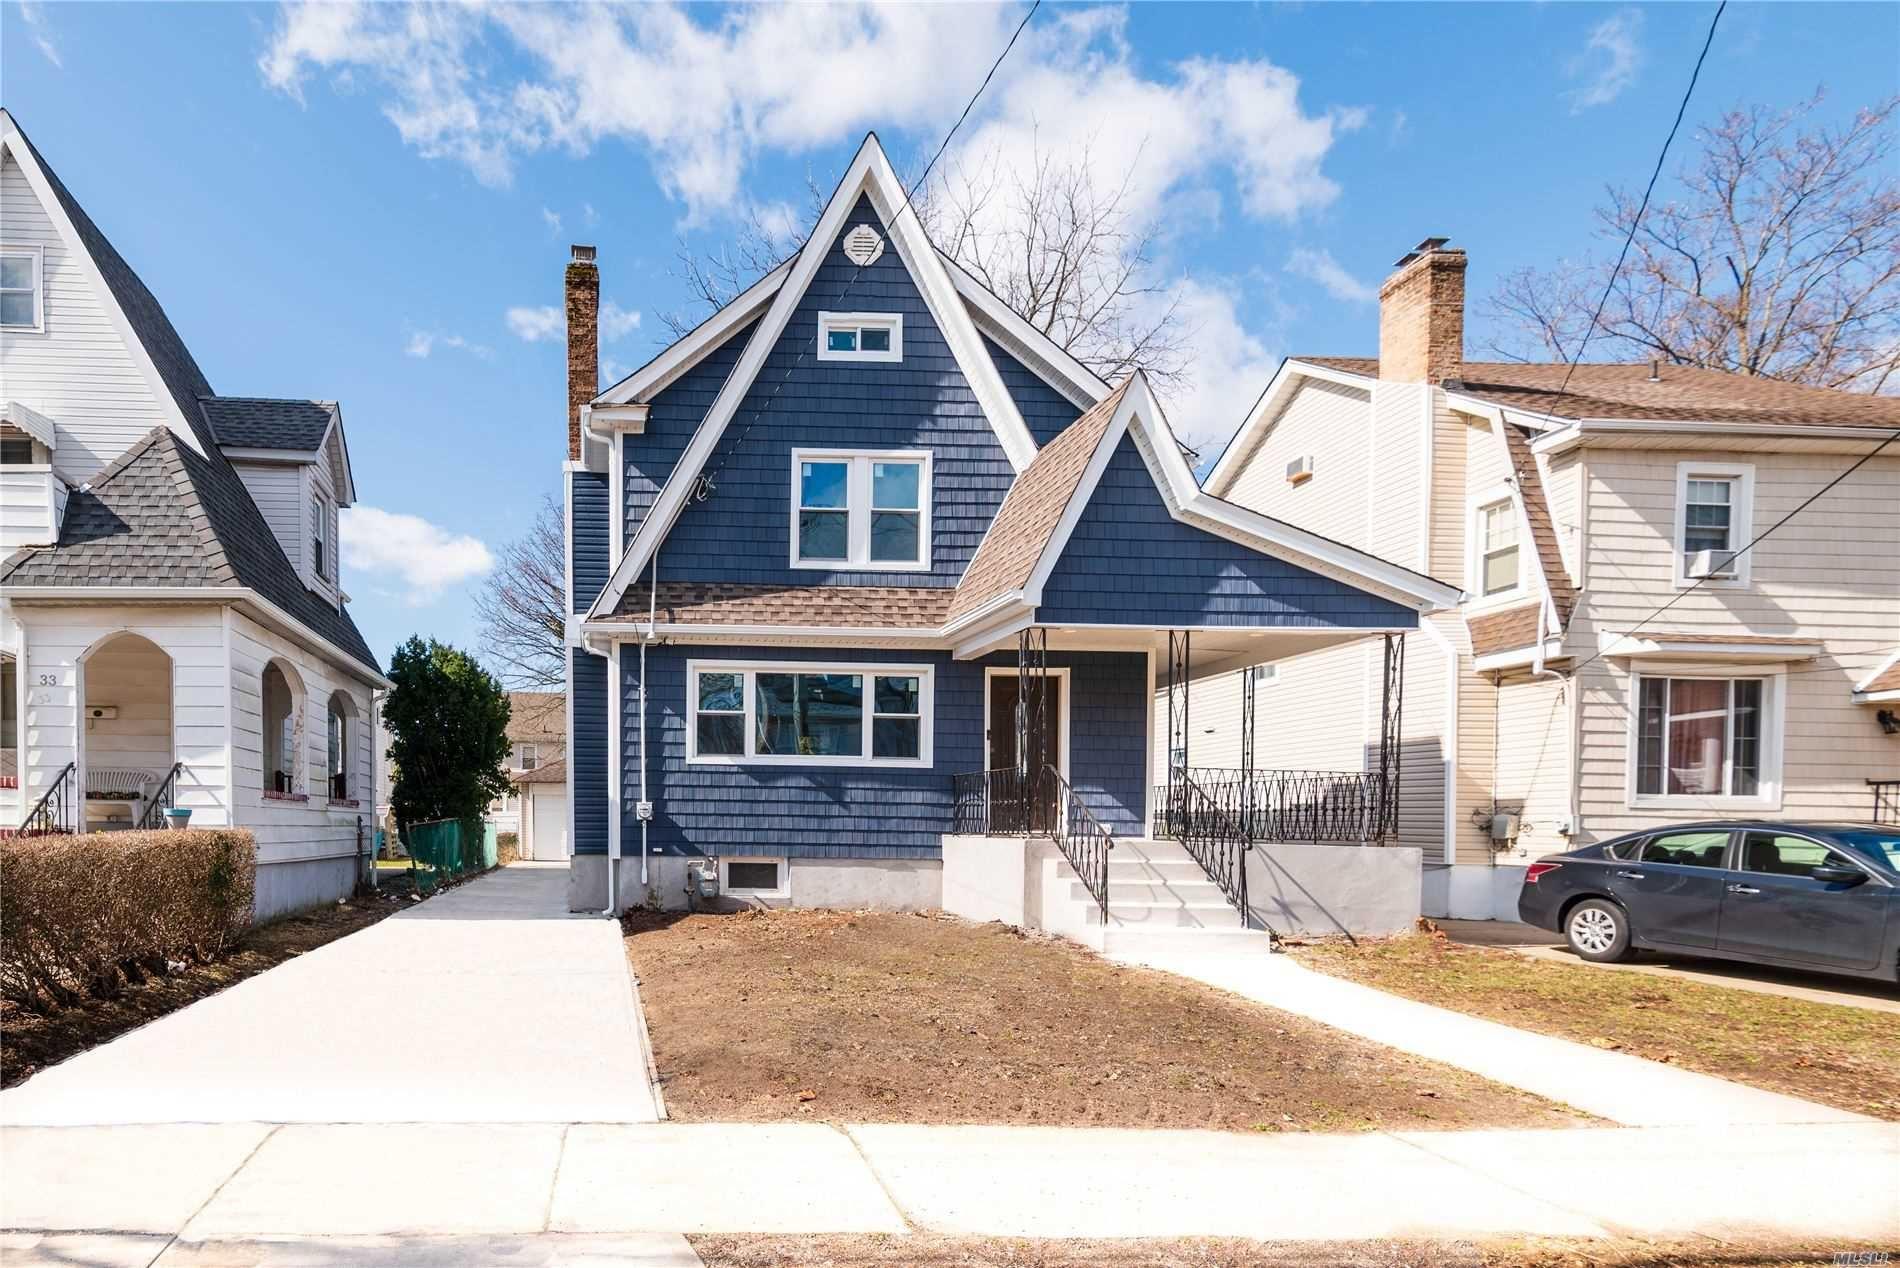 29 Florence Avenue, Hempstead, NY 11550 - MLS#: 3201247